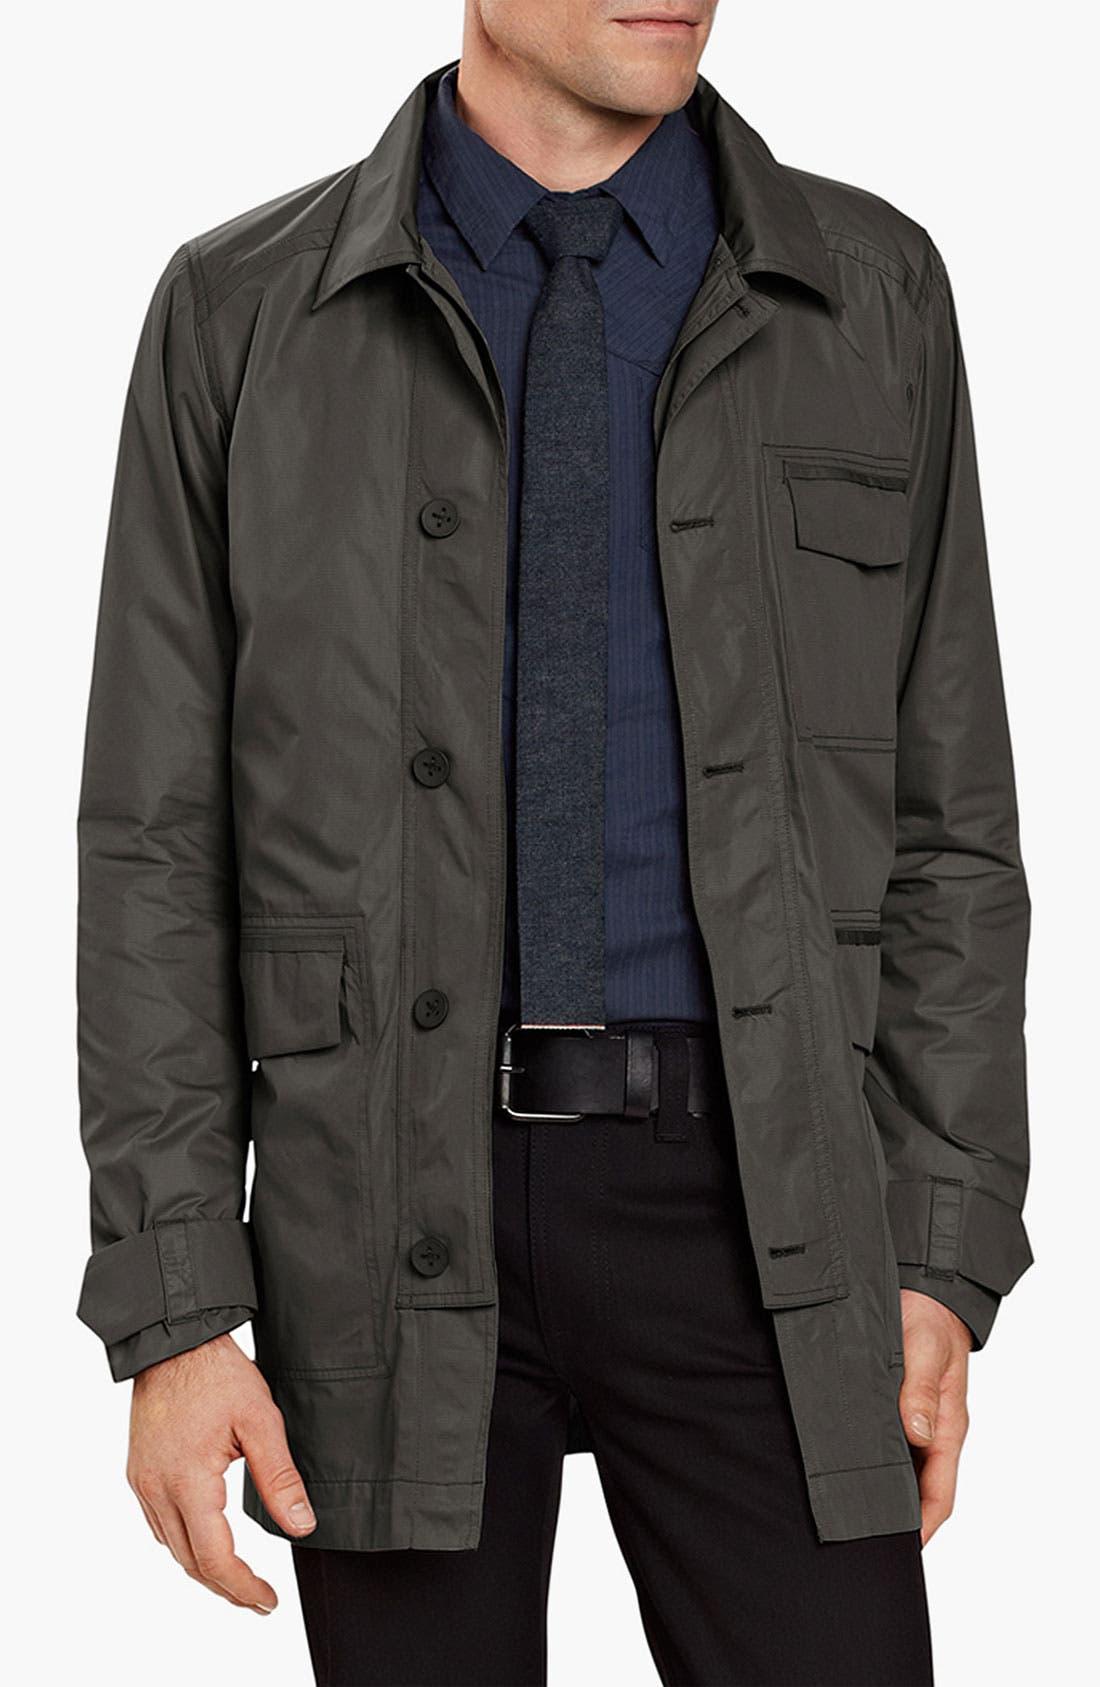 Alternate Image 1 Selected - Nau 'Motil' Trench Coat